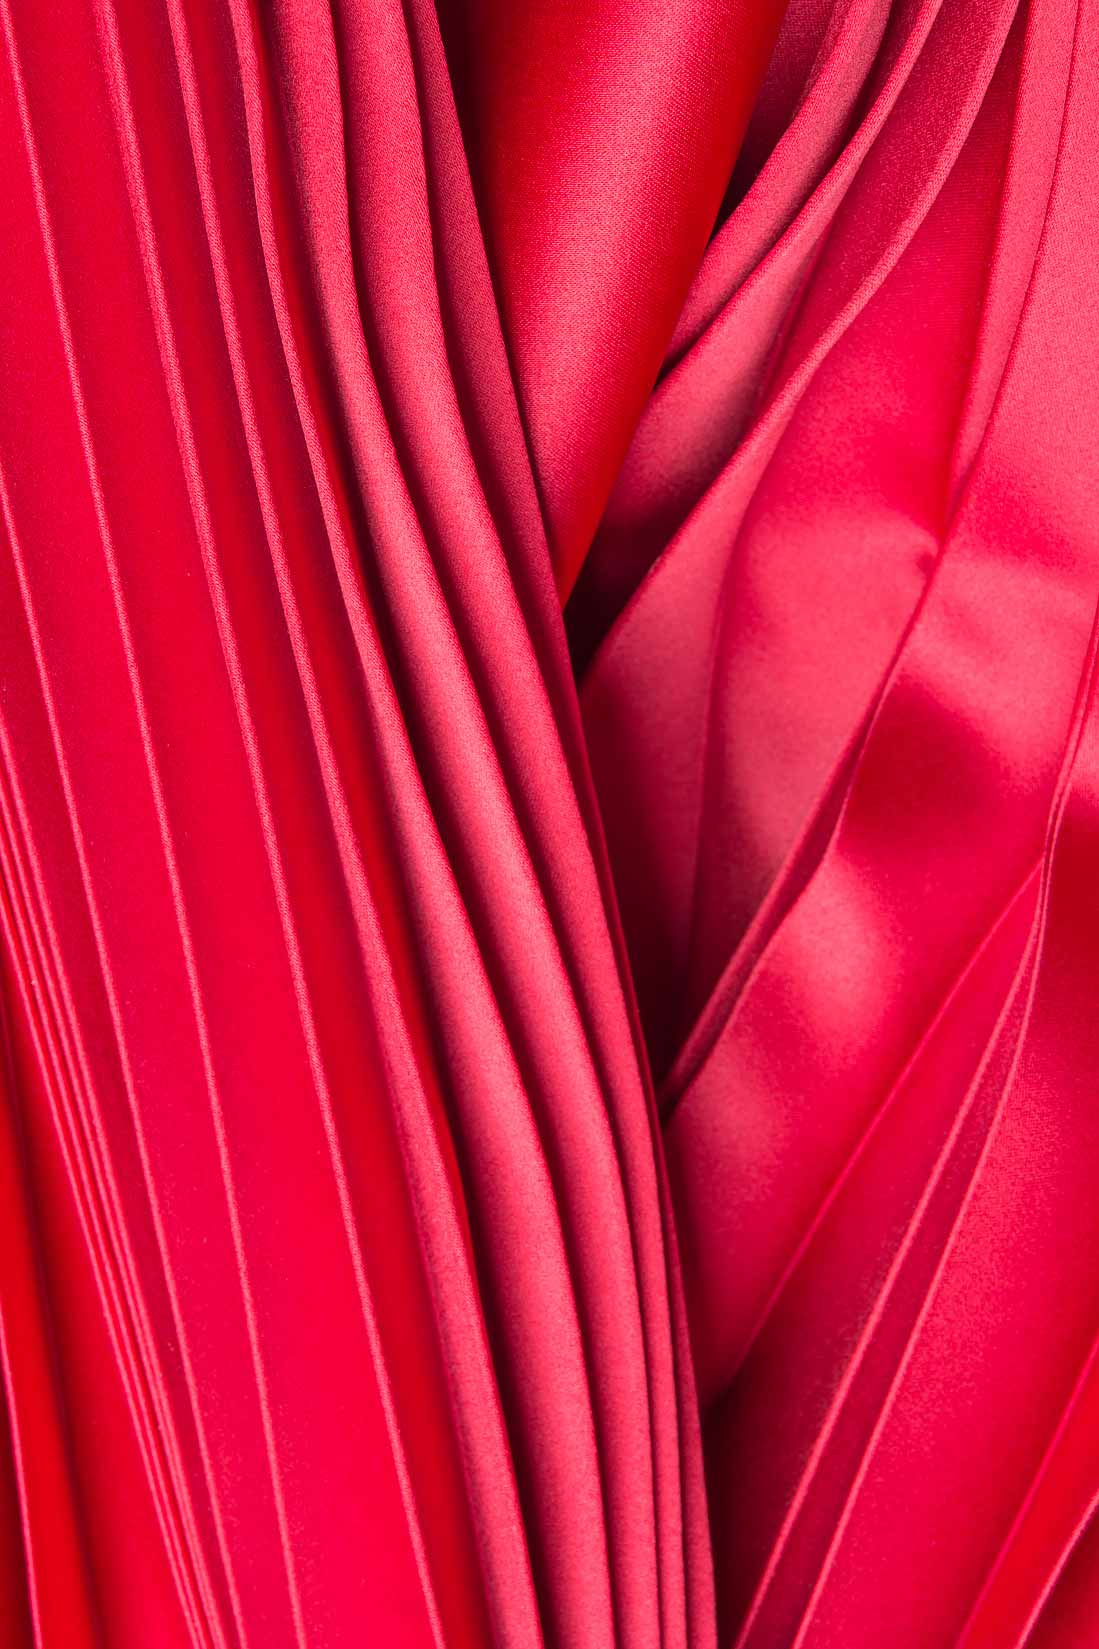 de4f7900b6 Pleated satin maxi skirt Karmen Herscovici image 3